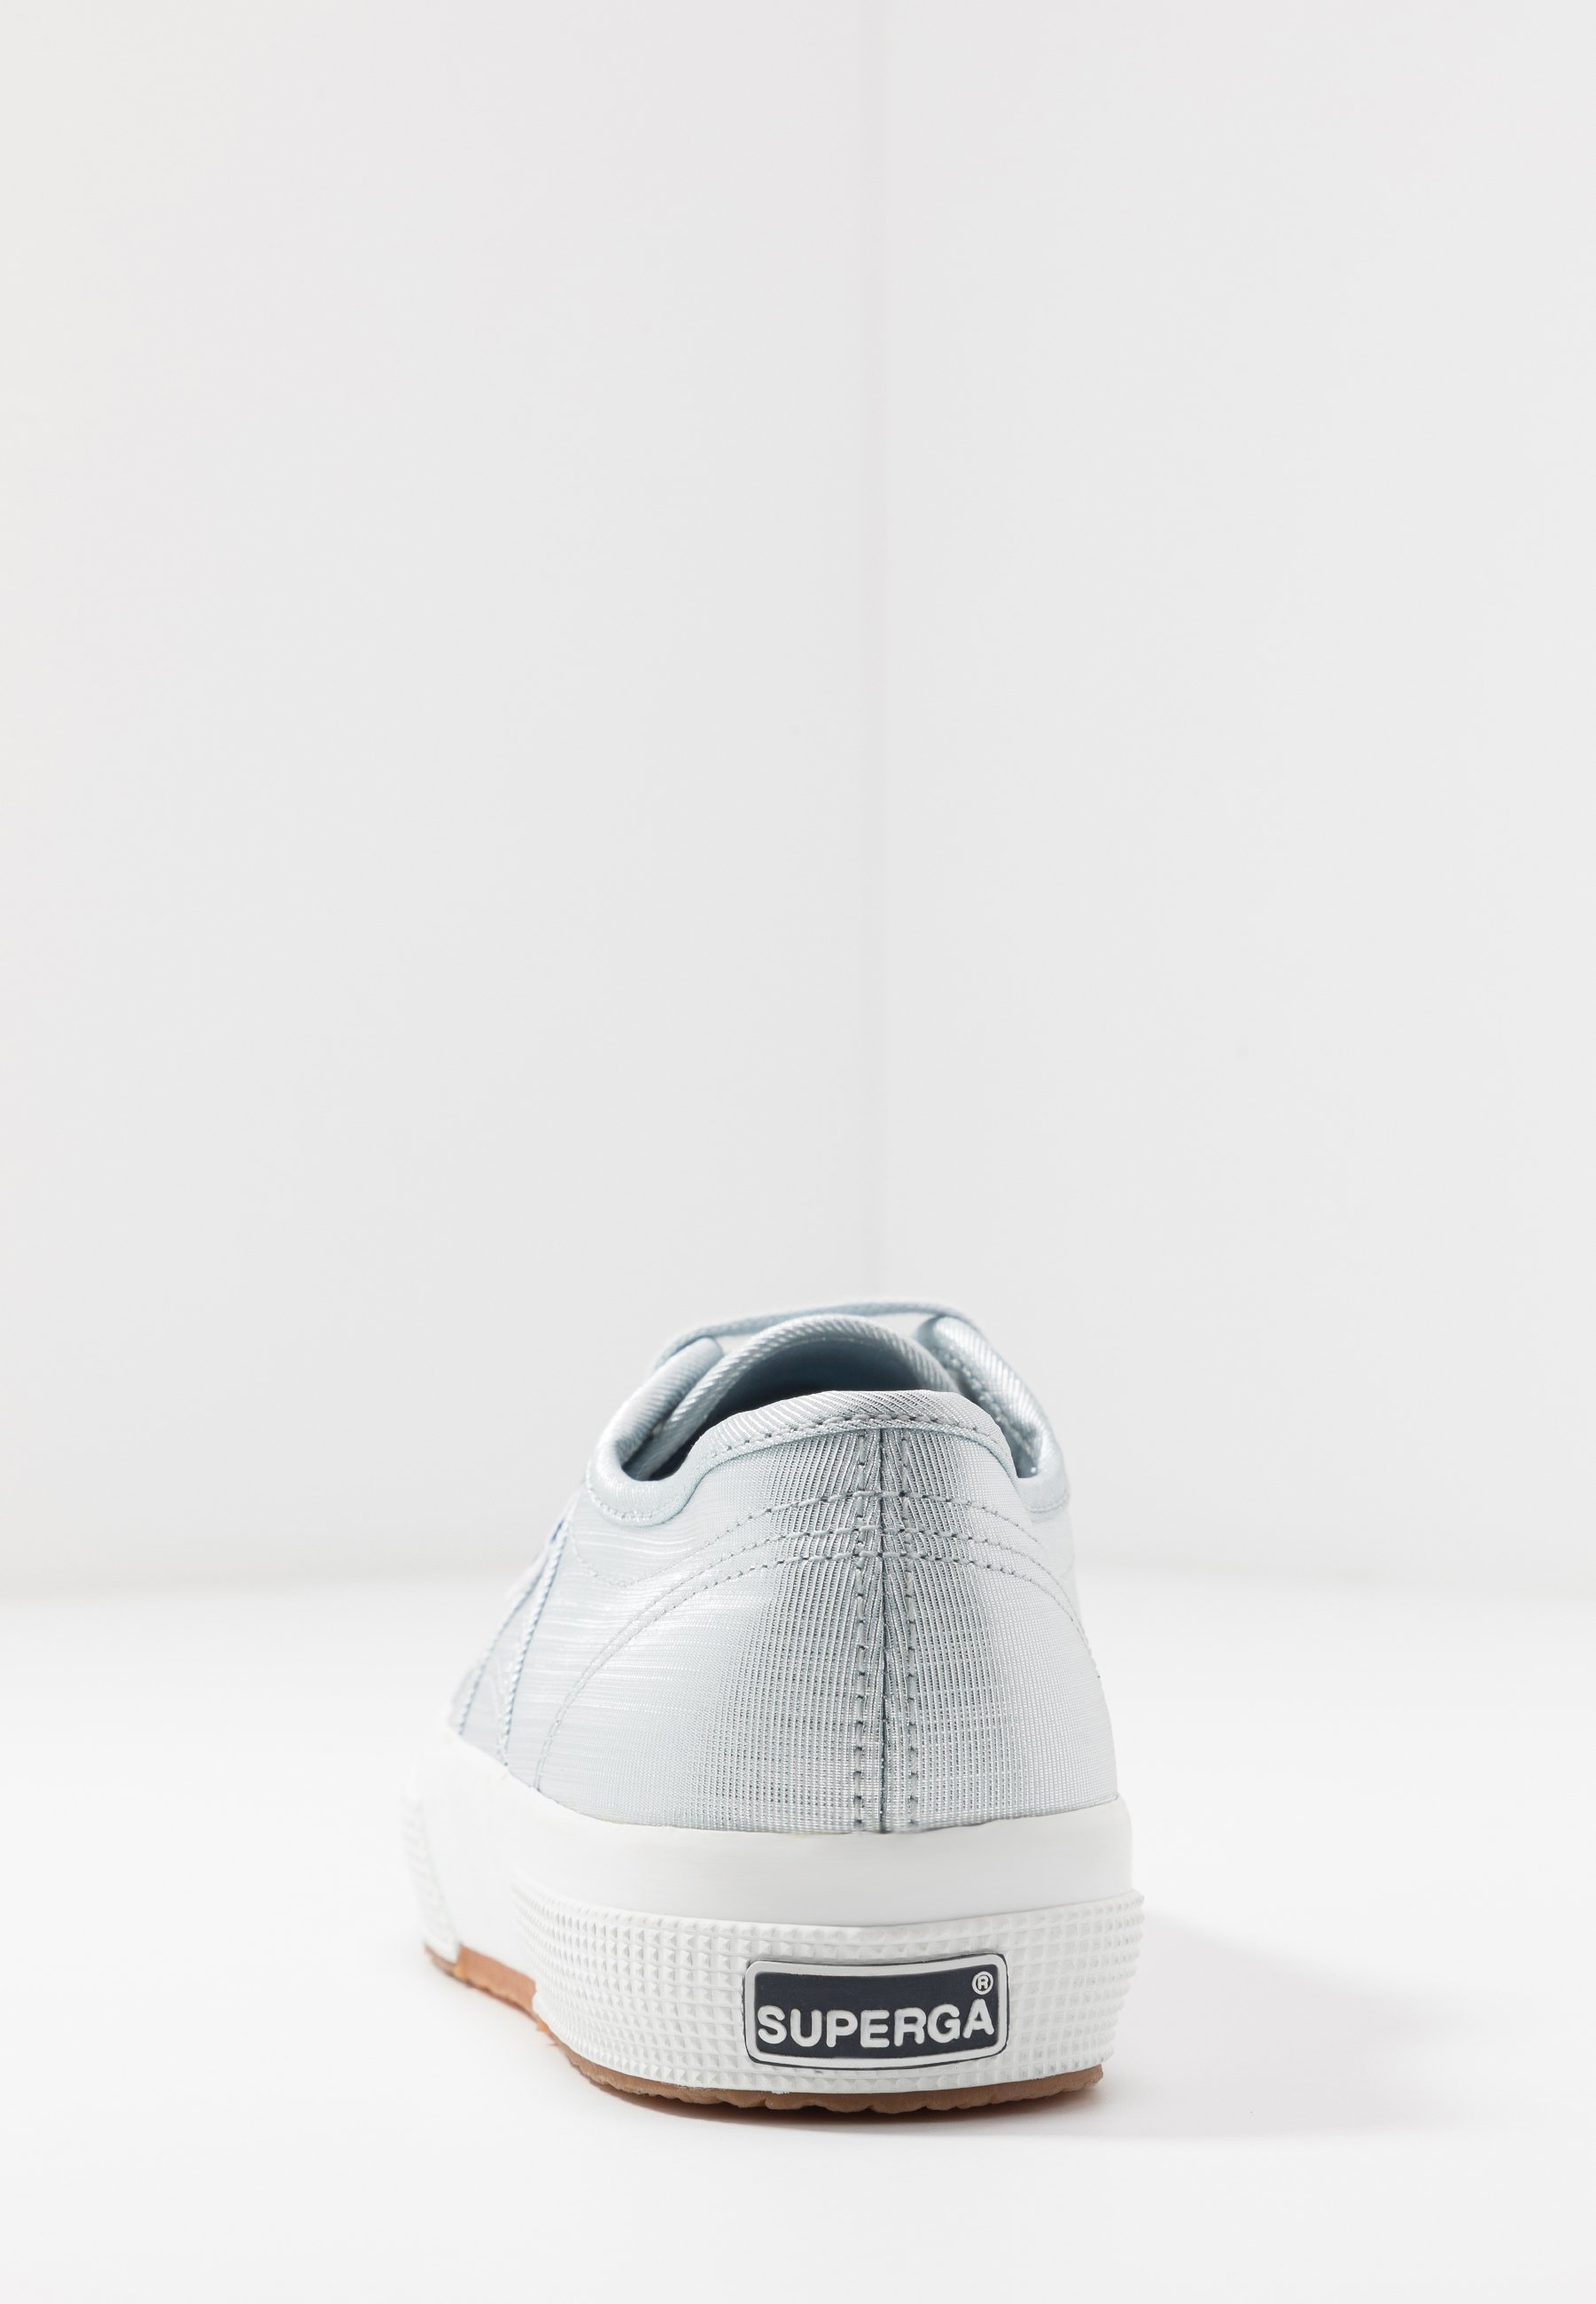 Superga 2750 - Sneakers Basse Blue Light Sky cPSX2